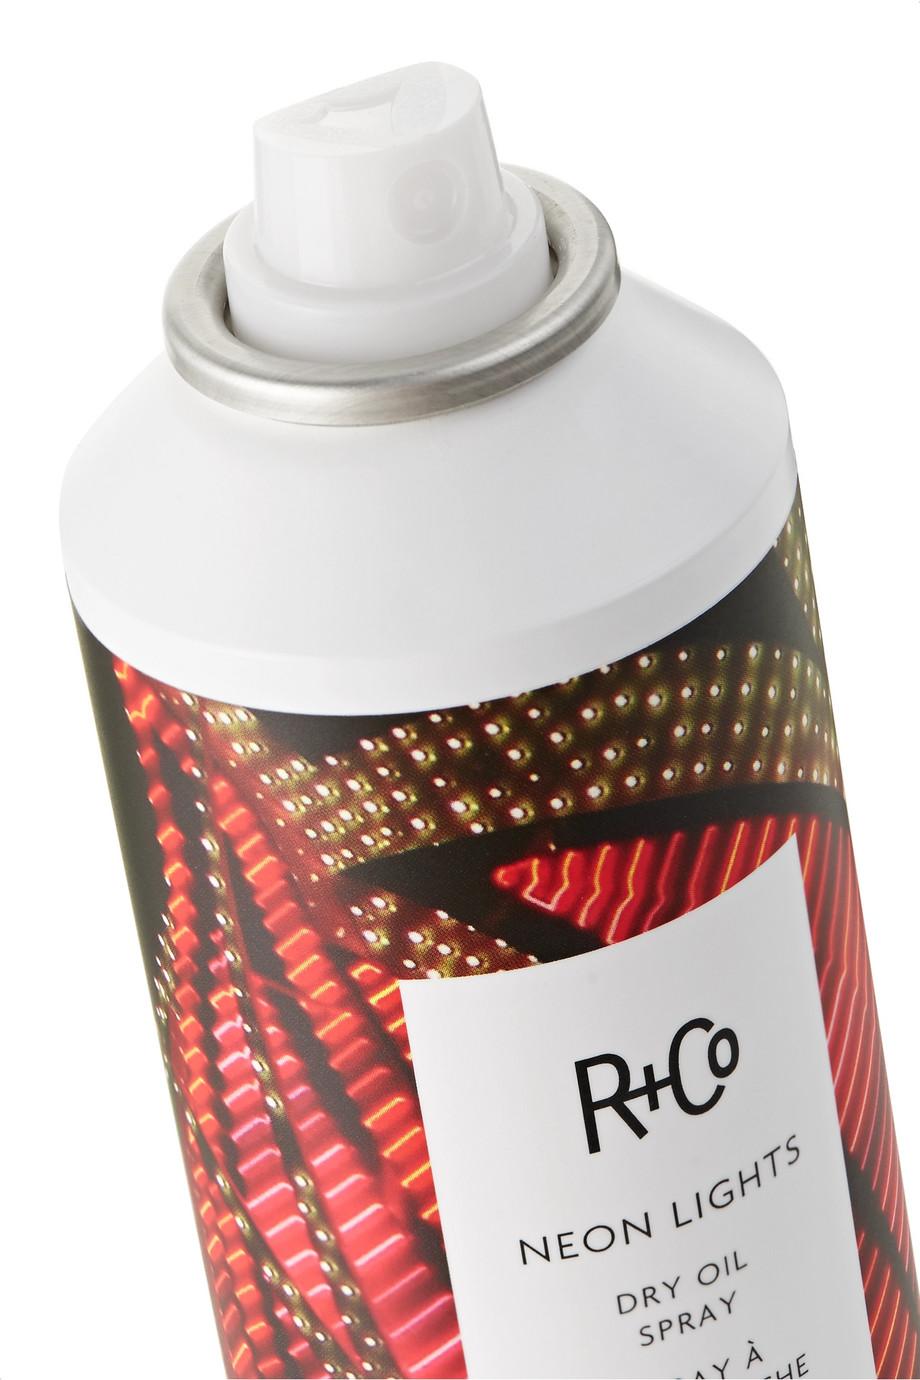 R+Co Neon Lights Dry Oil Spray, 118ml